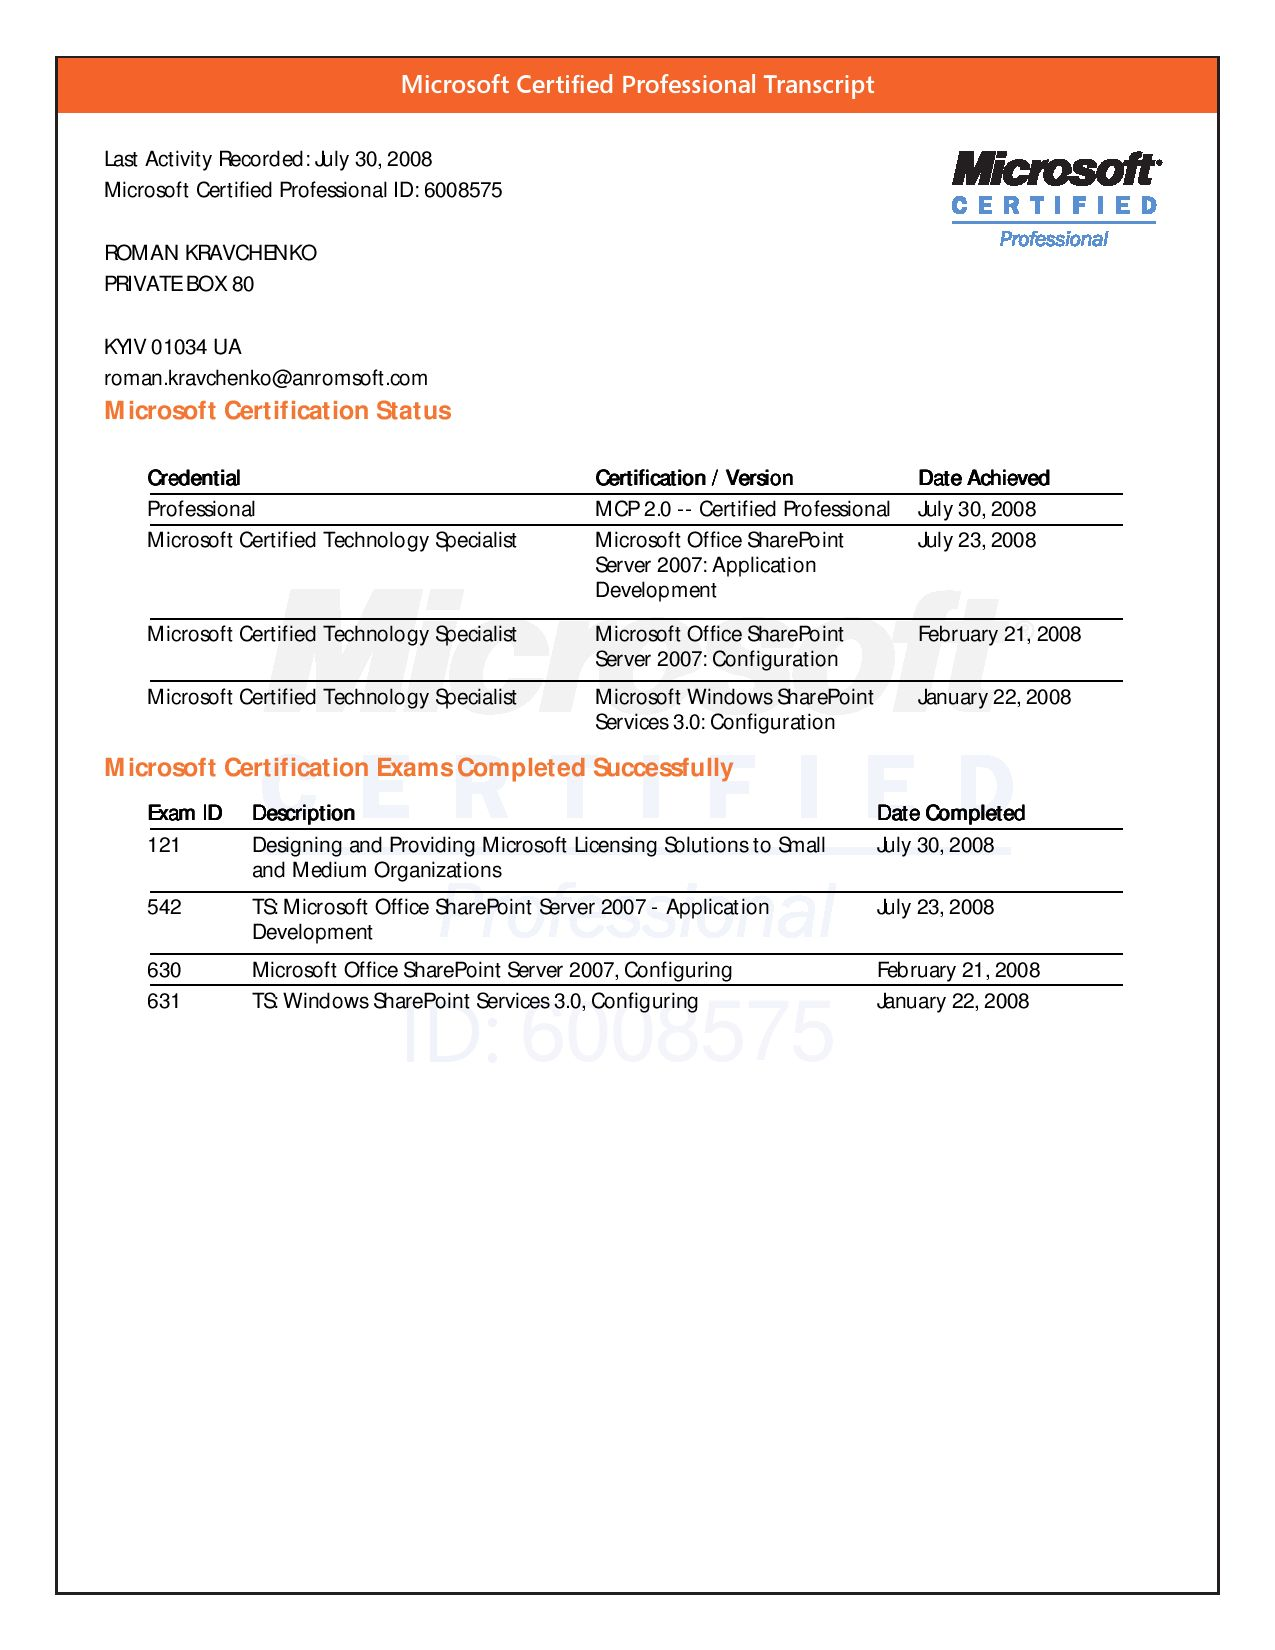 Microsoft Certified Professional Transcript By Romanavchenko Issuu